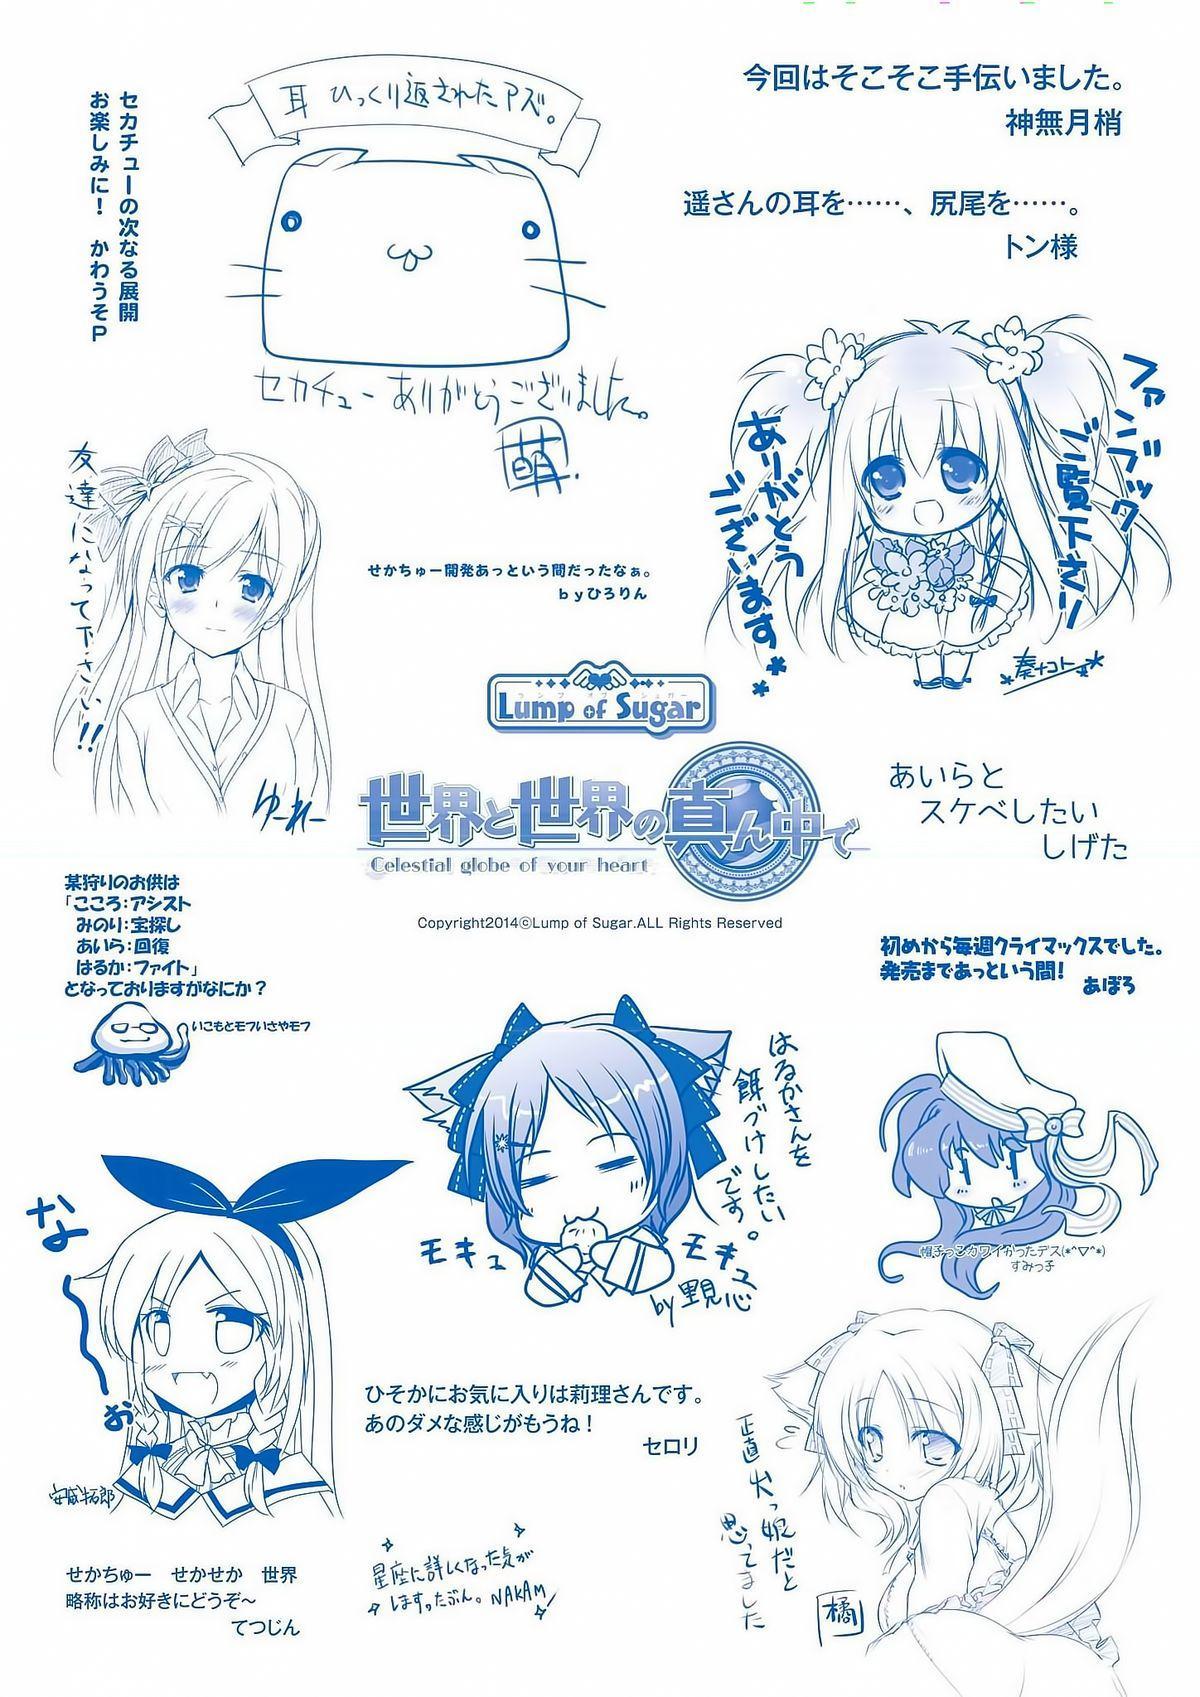 Sekai to Sekai no Mannaka de Visual Fanbook 128